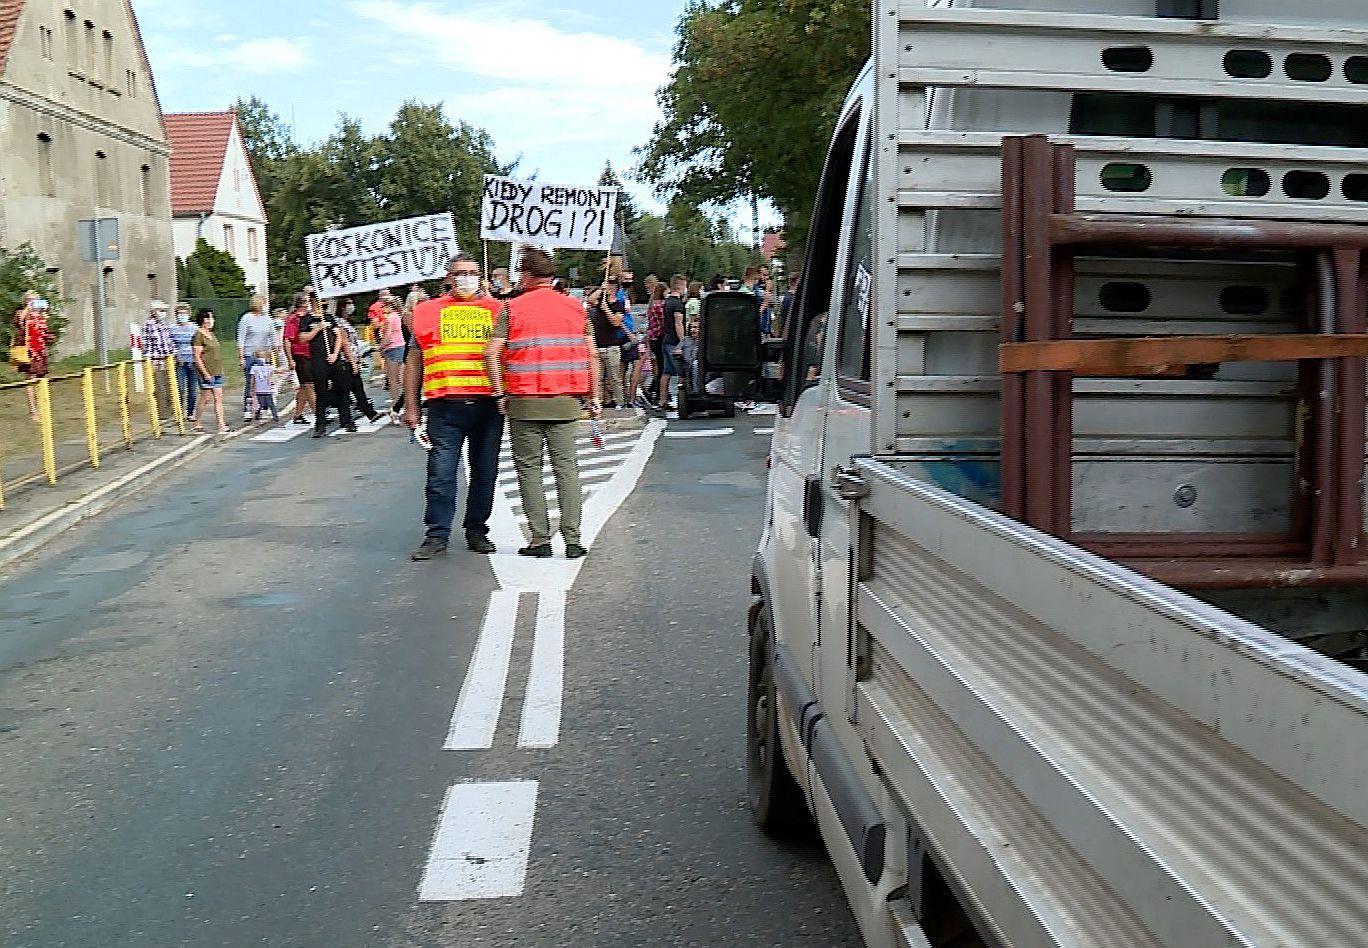 W ramach protestu blokowali ruch (WIDEO)